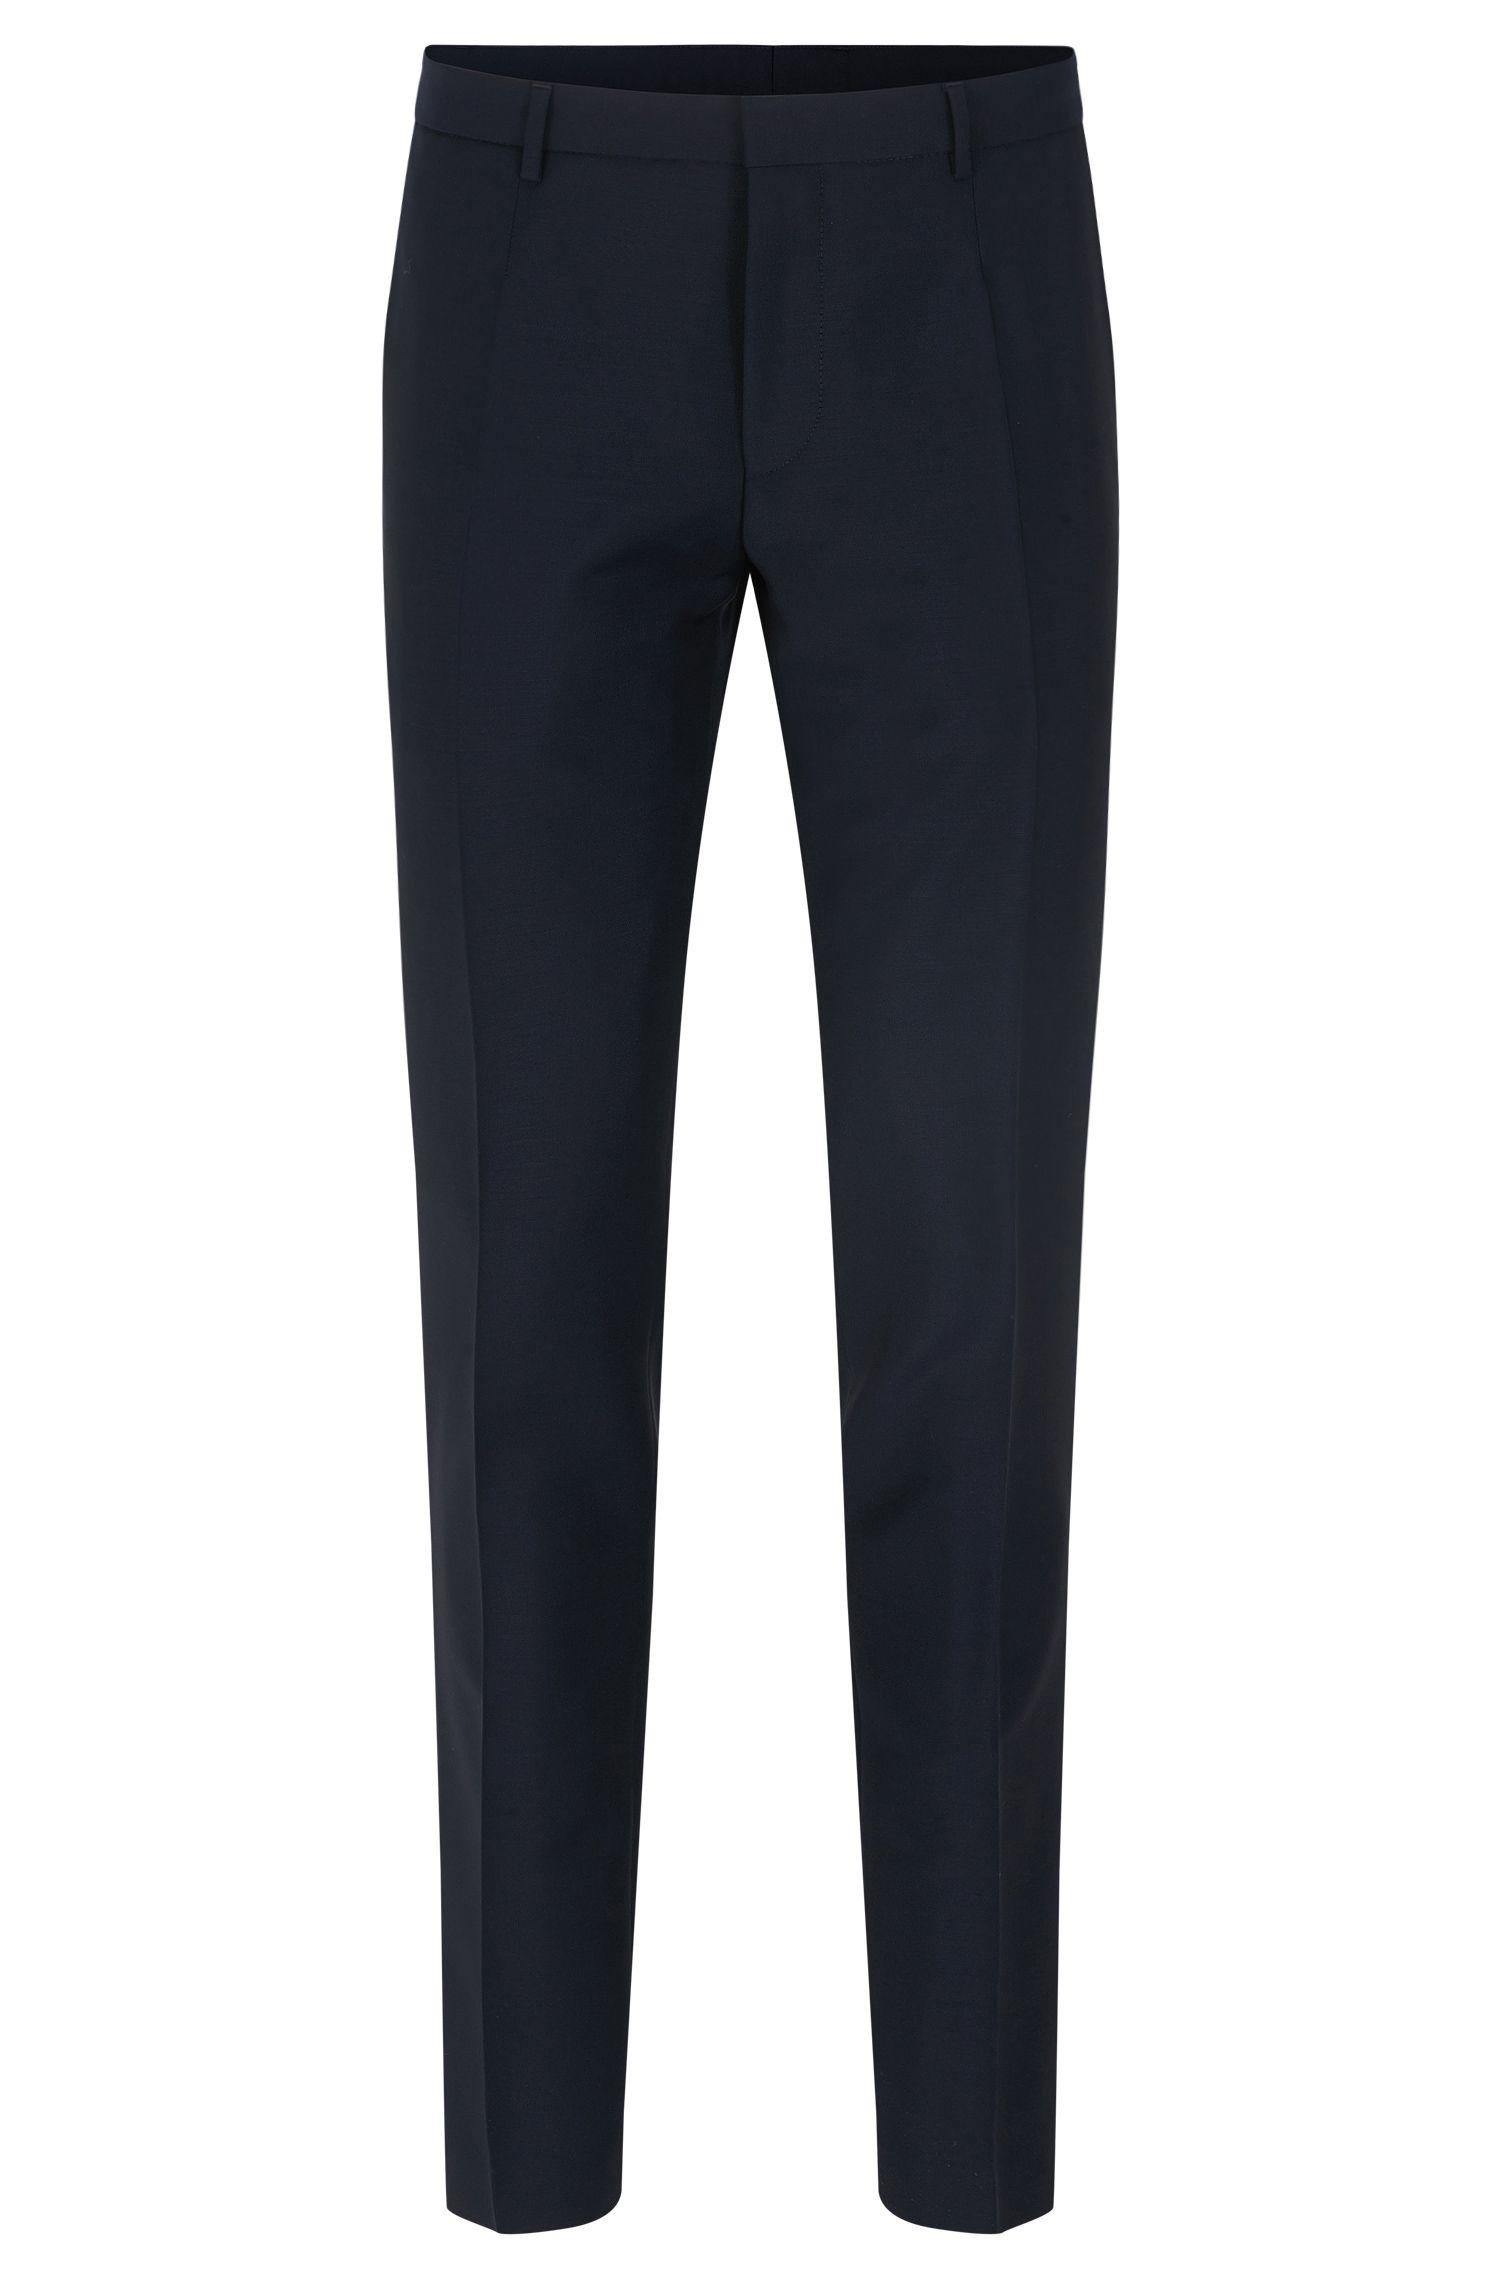 Pantaloni extra slim fit in lana vergine con mohair